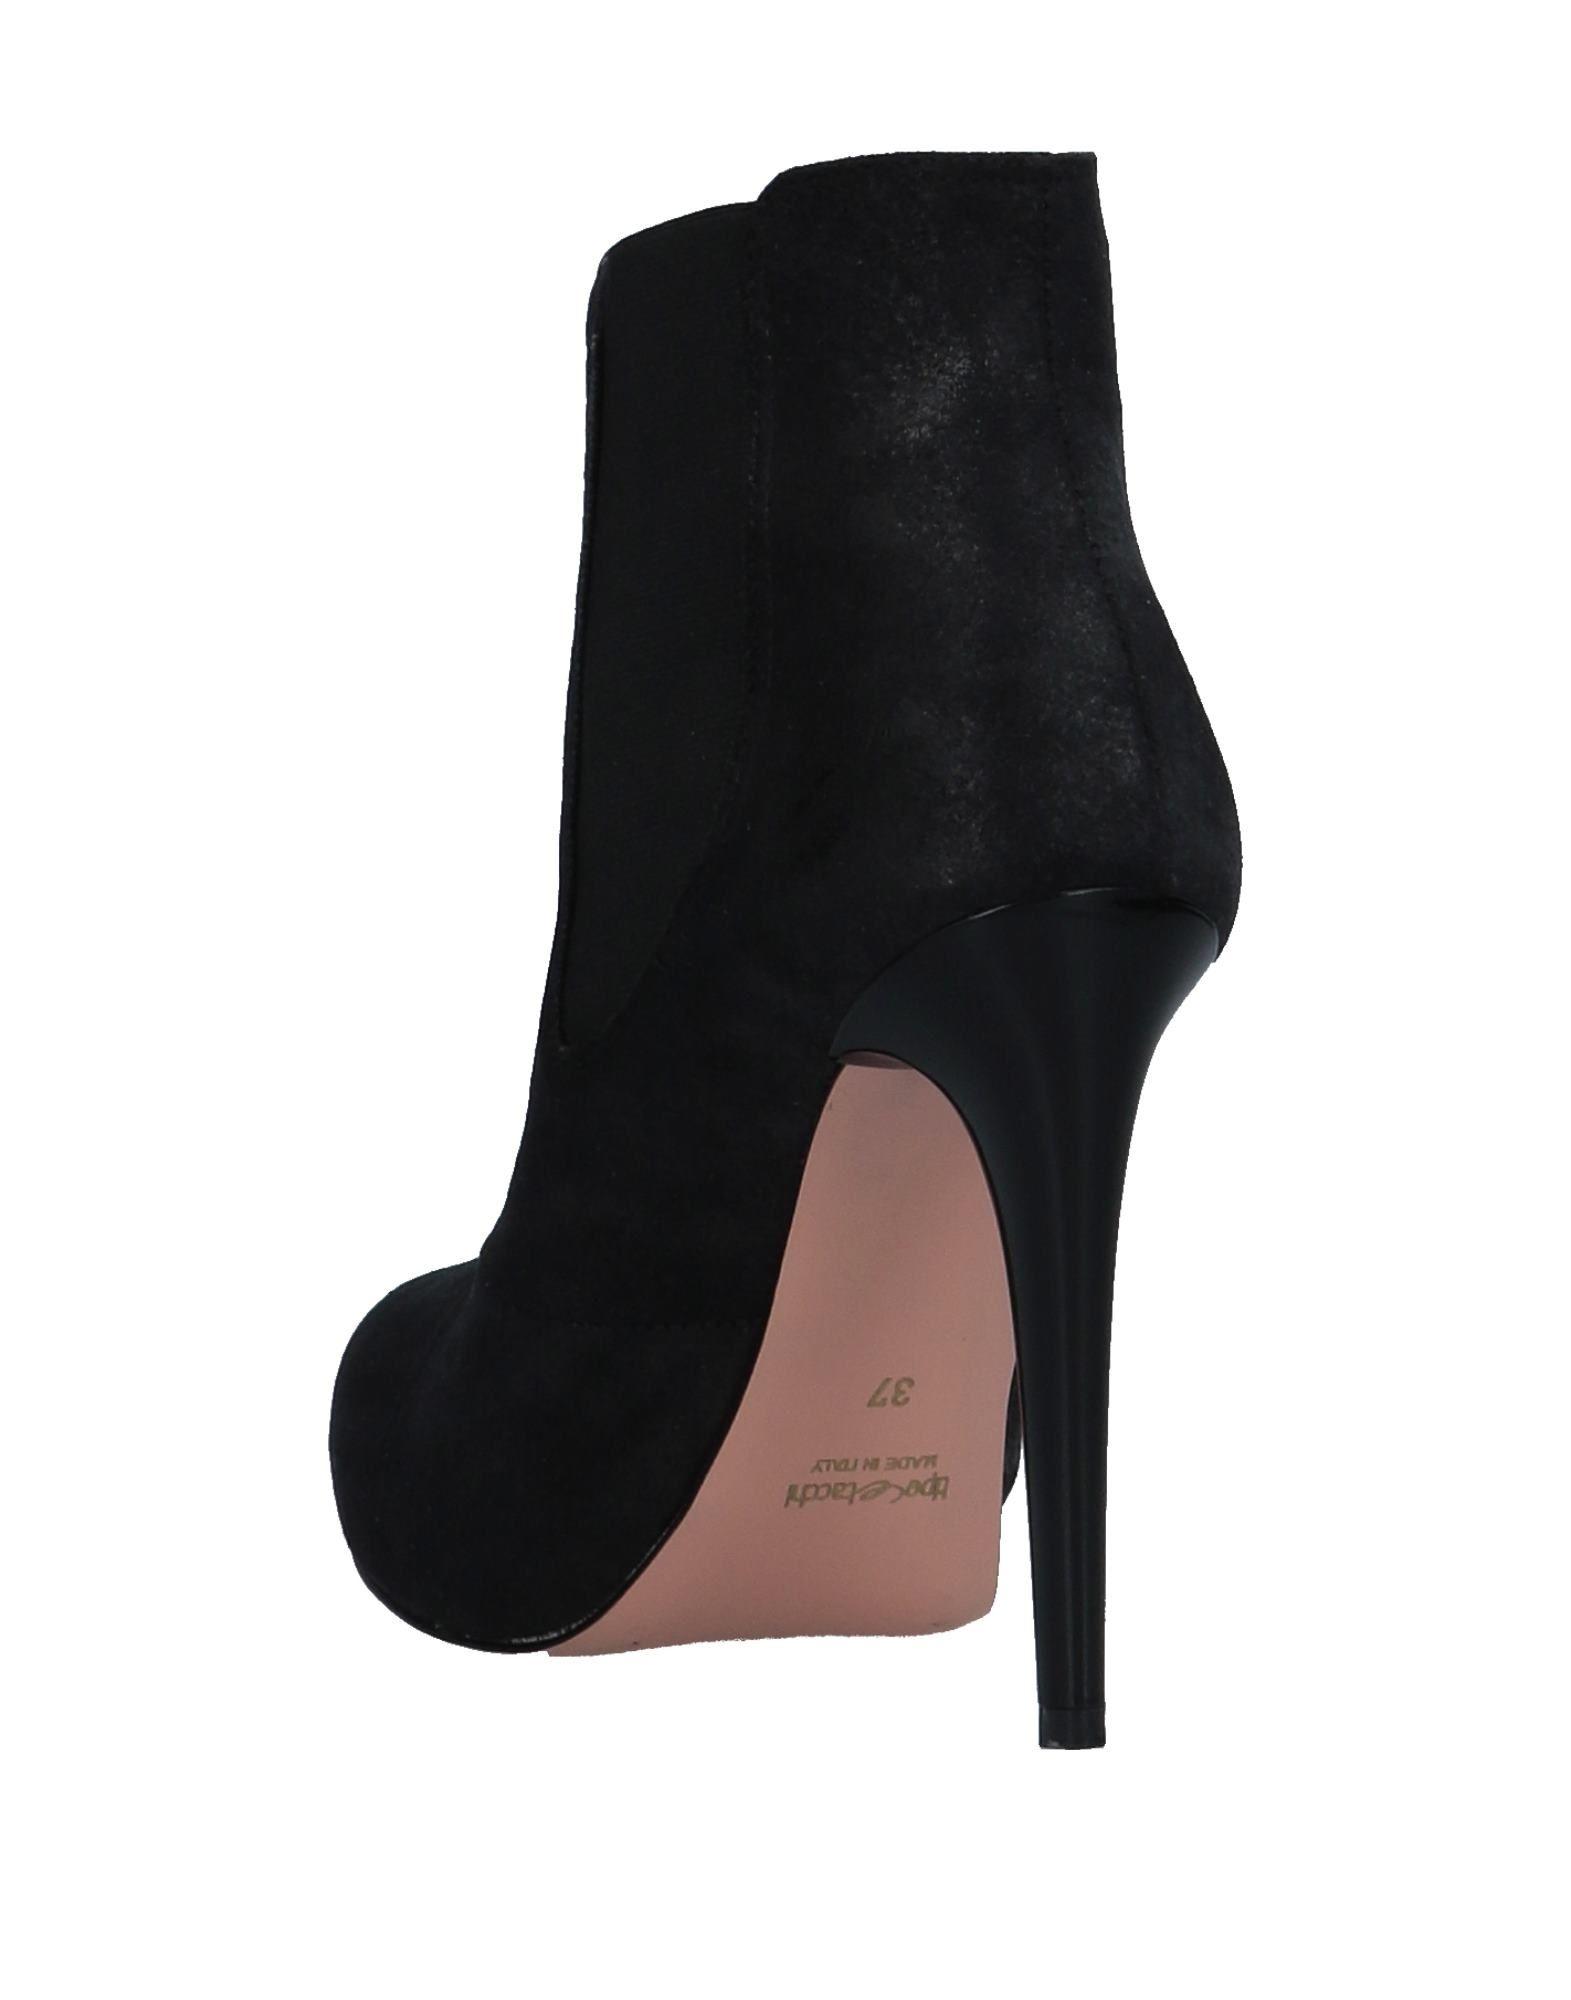 Tipe E Tacchi Stiefelette Damen beliebte  11538812CK Gute Qualität beliebte Damen Schuhe 258a49